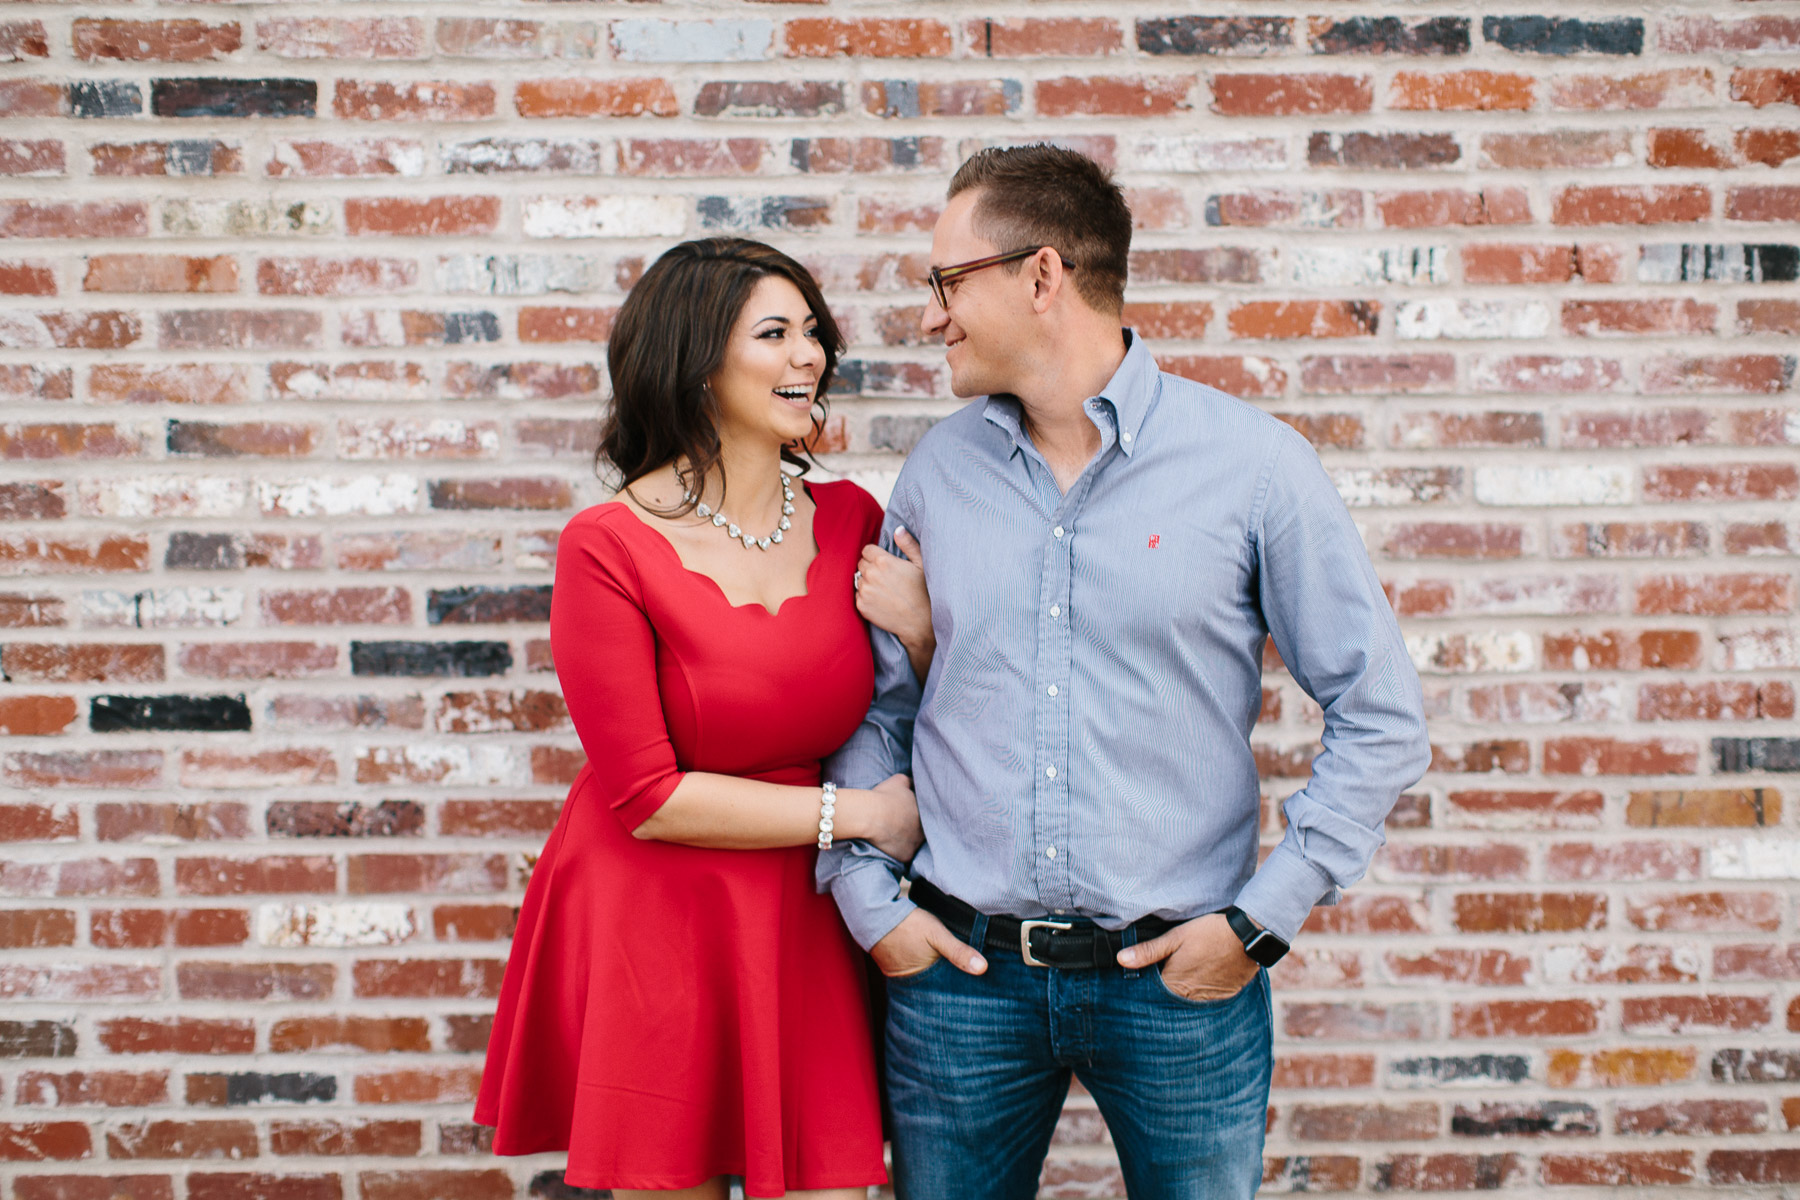 Luxium-Weddings-@matt__le-Engagement-Heritage-Square-Park-Downtown-Phoenix-Urban-Photography-100.jpg